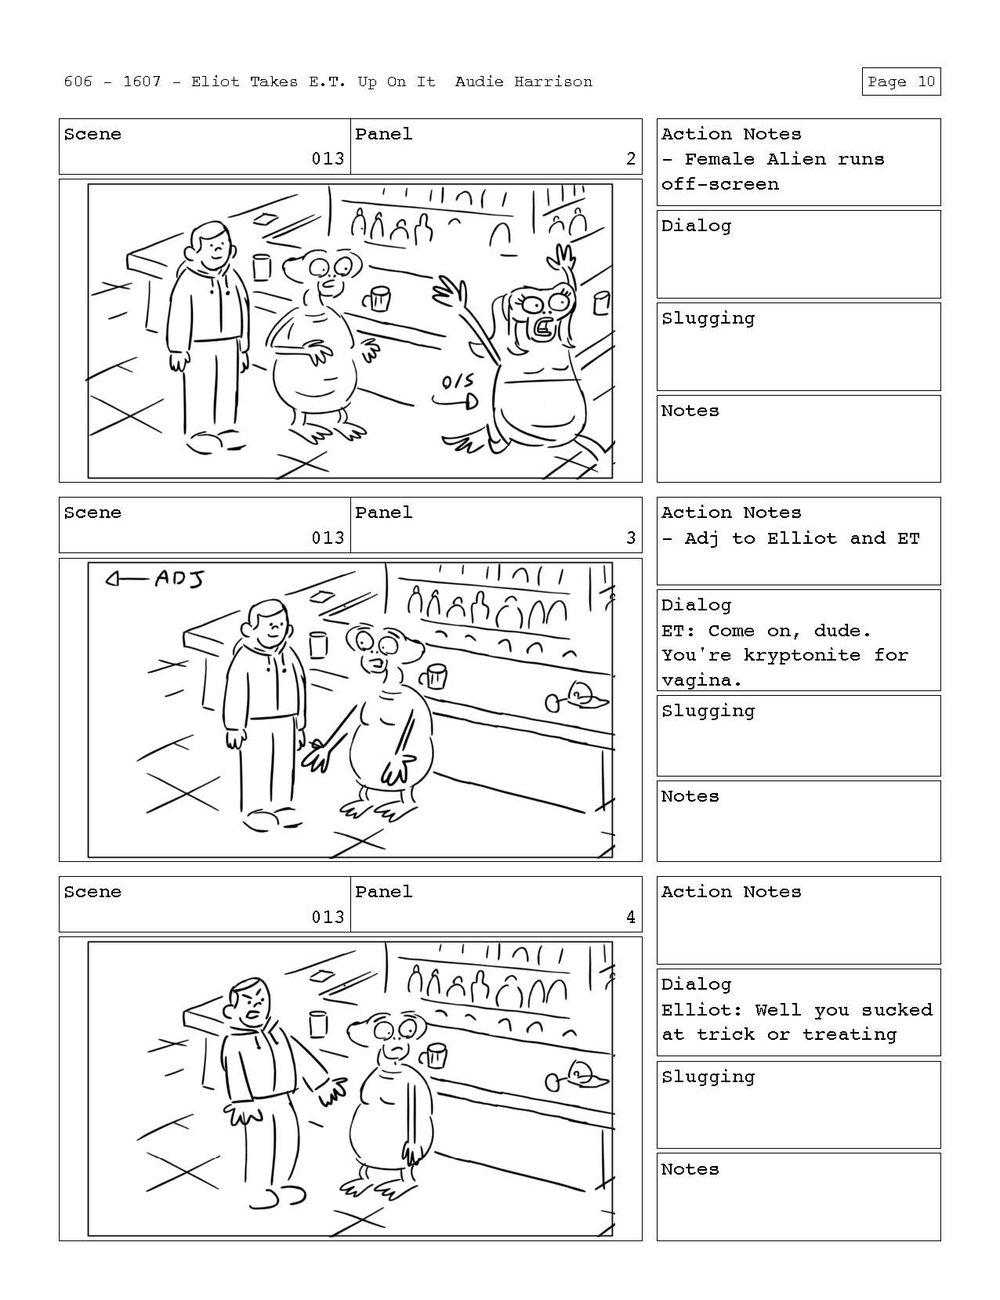 Elliott_Takes_ET_Page_11.jpg